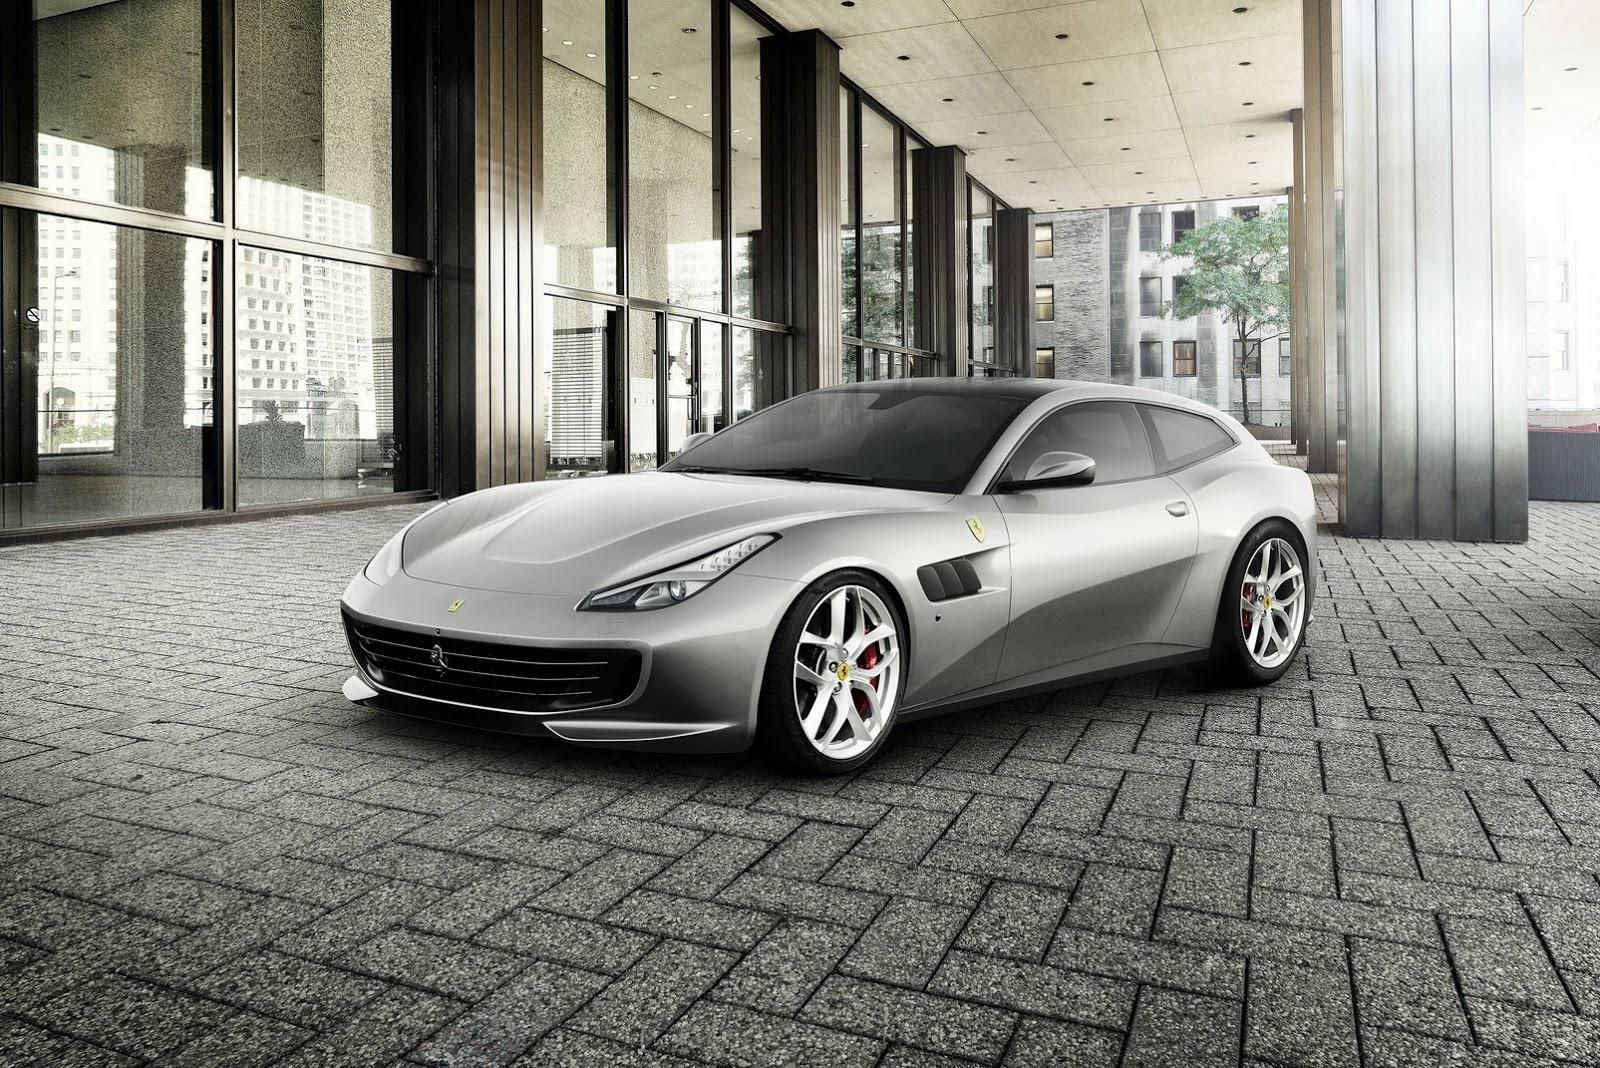 Ferrari GTC4 Lusso T photo gallery